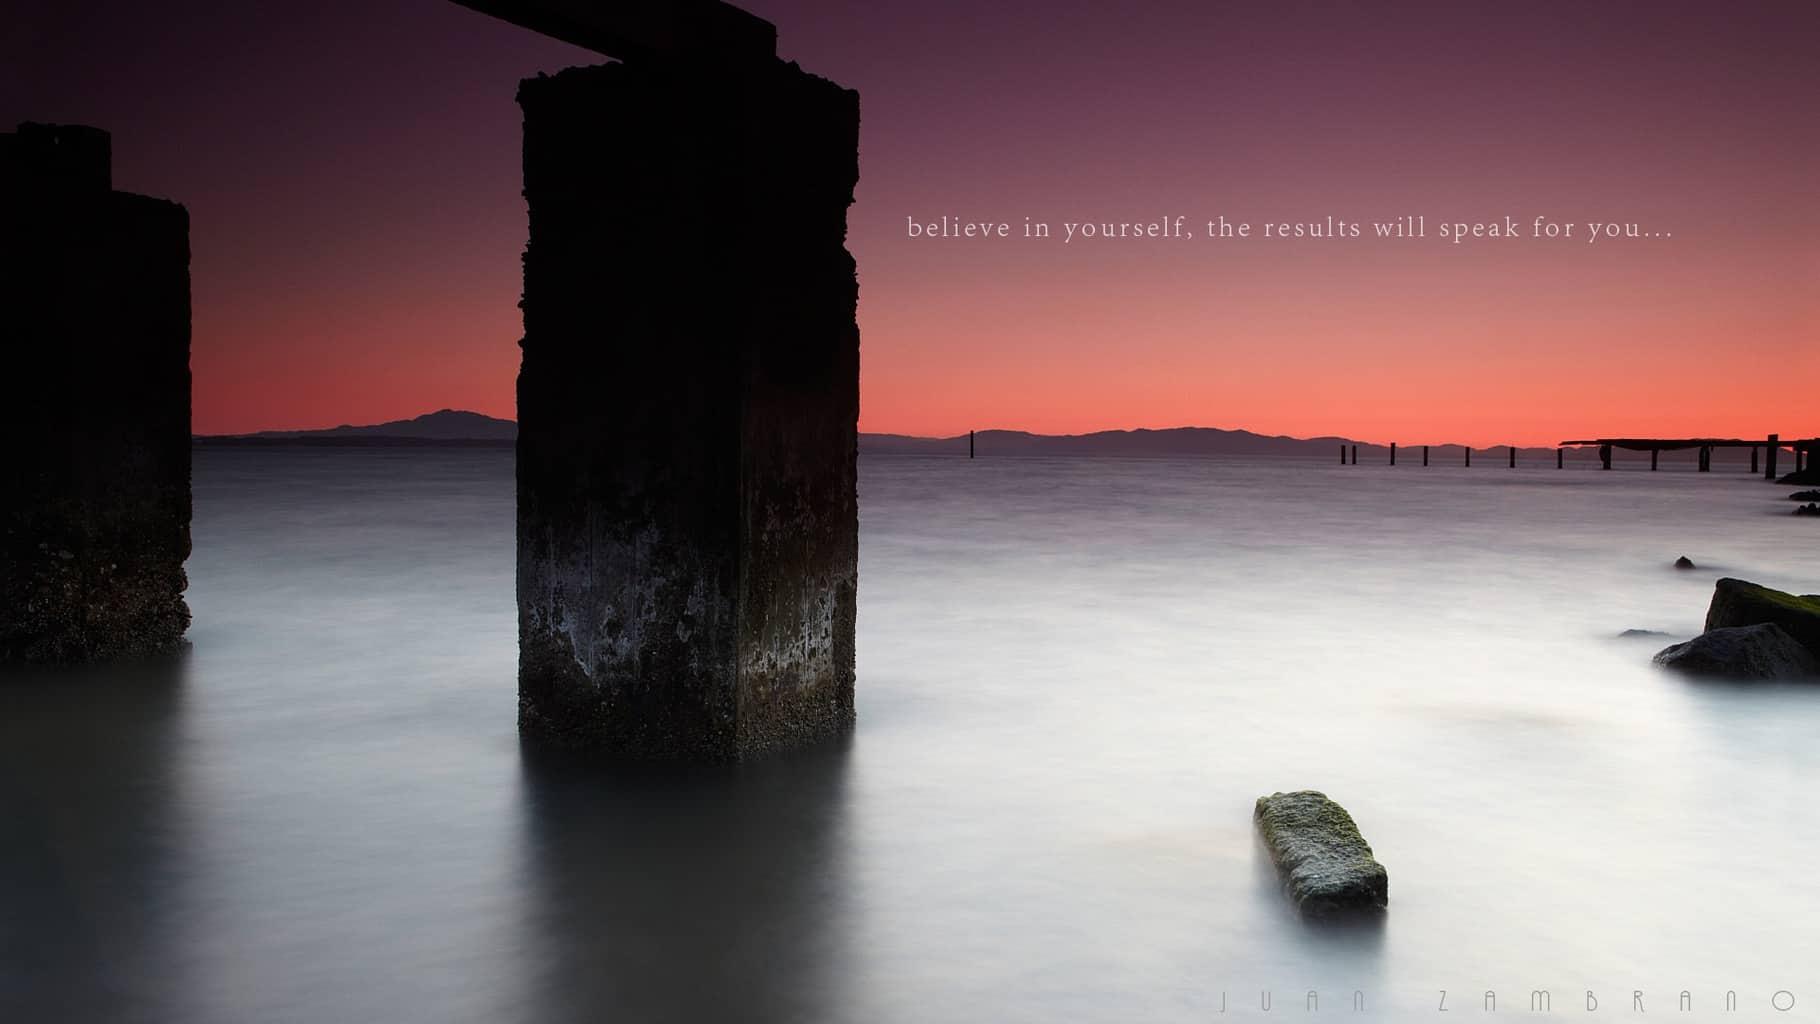 inspirational quotes desktop wallpapers